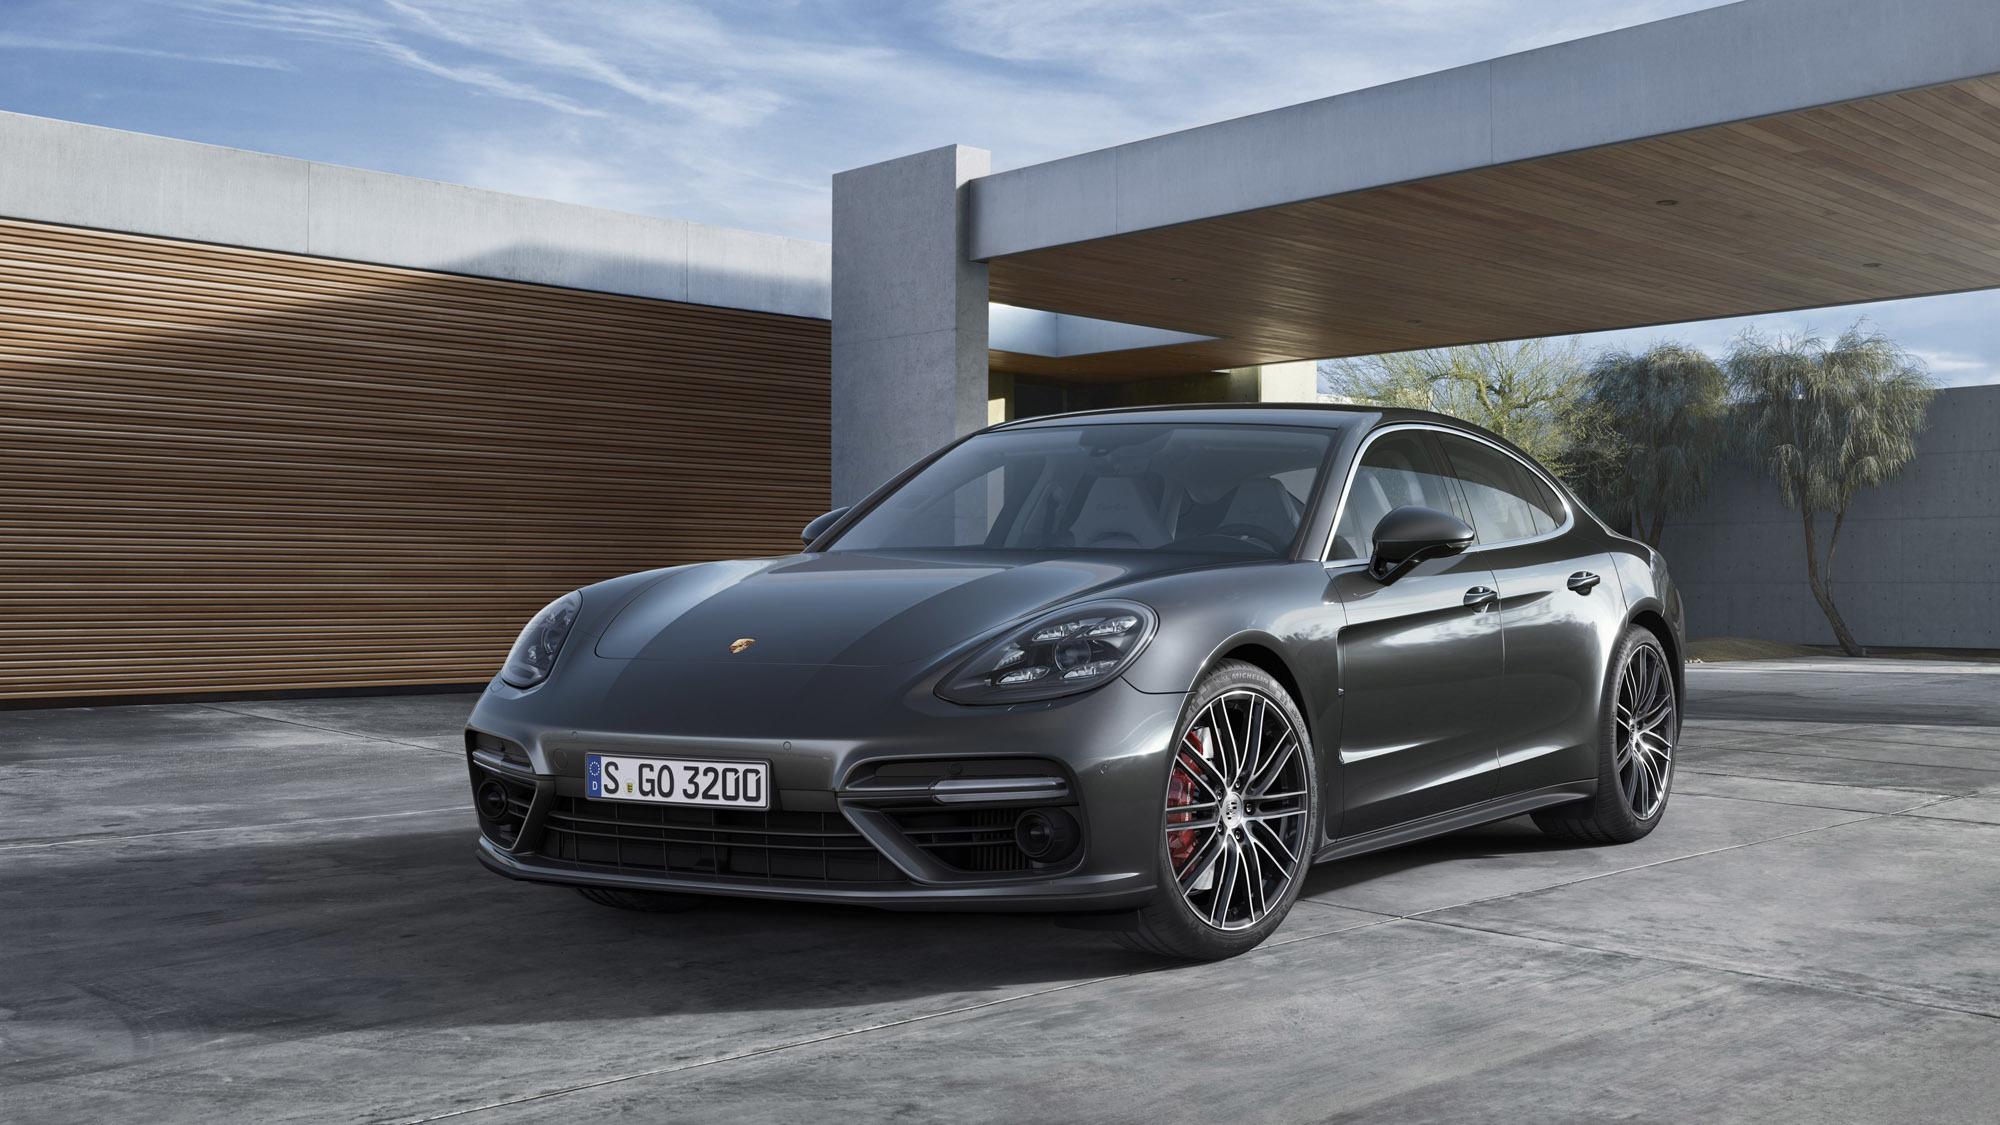 Porsche Panamera 2016 Pictures